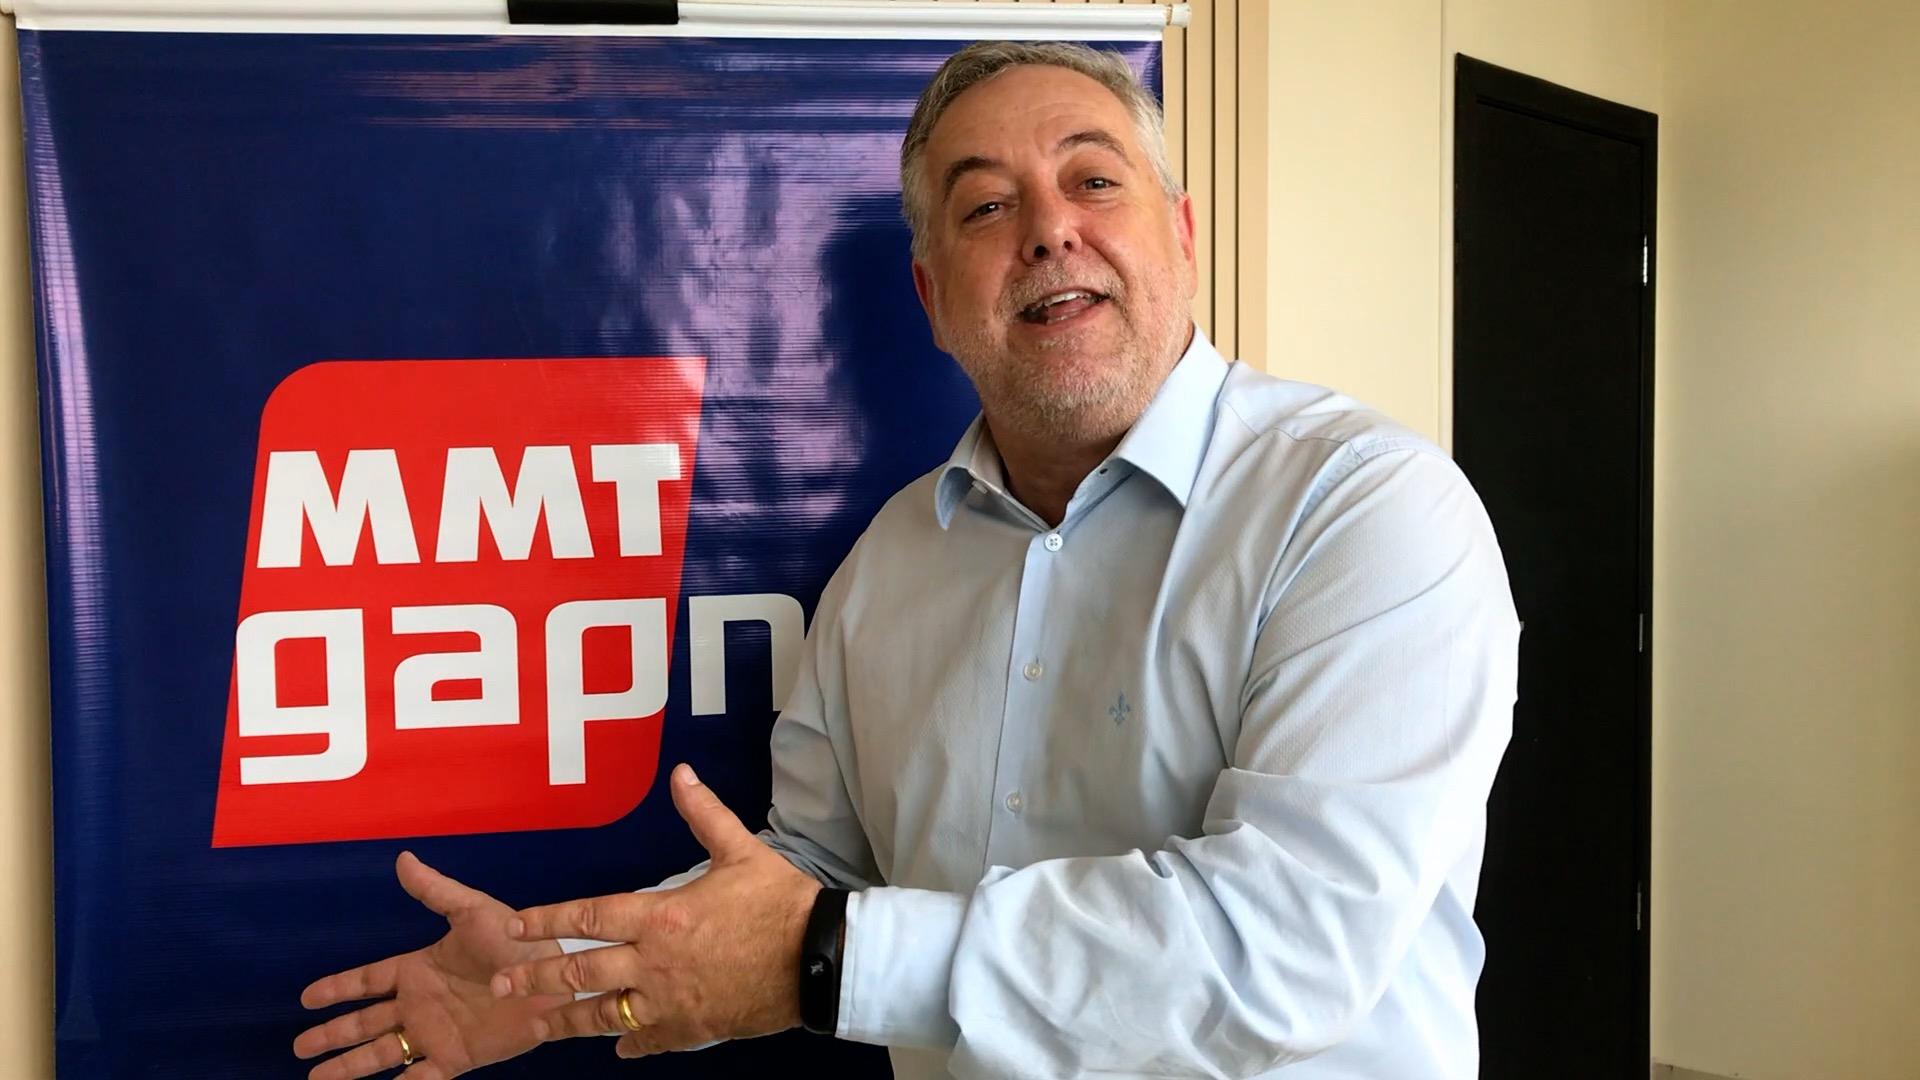 Michael Barkoczy, presidente da MMTGapnet